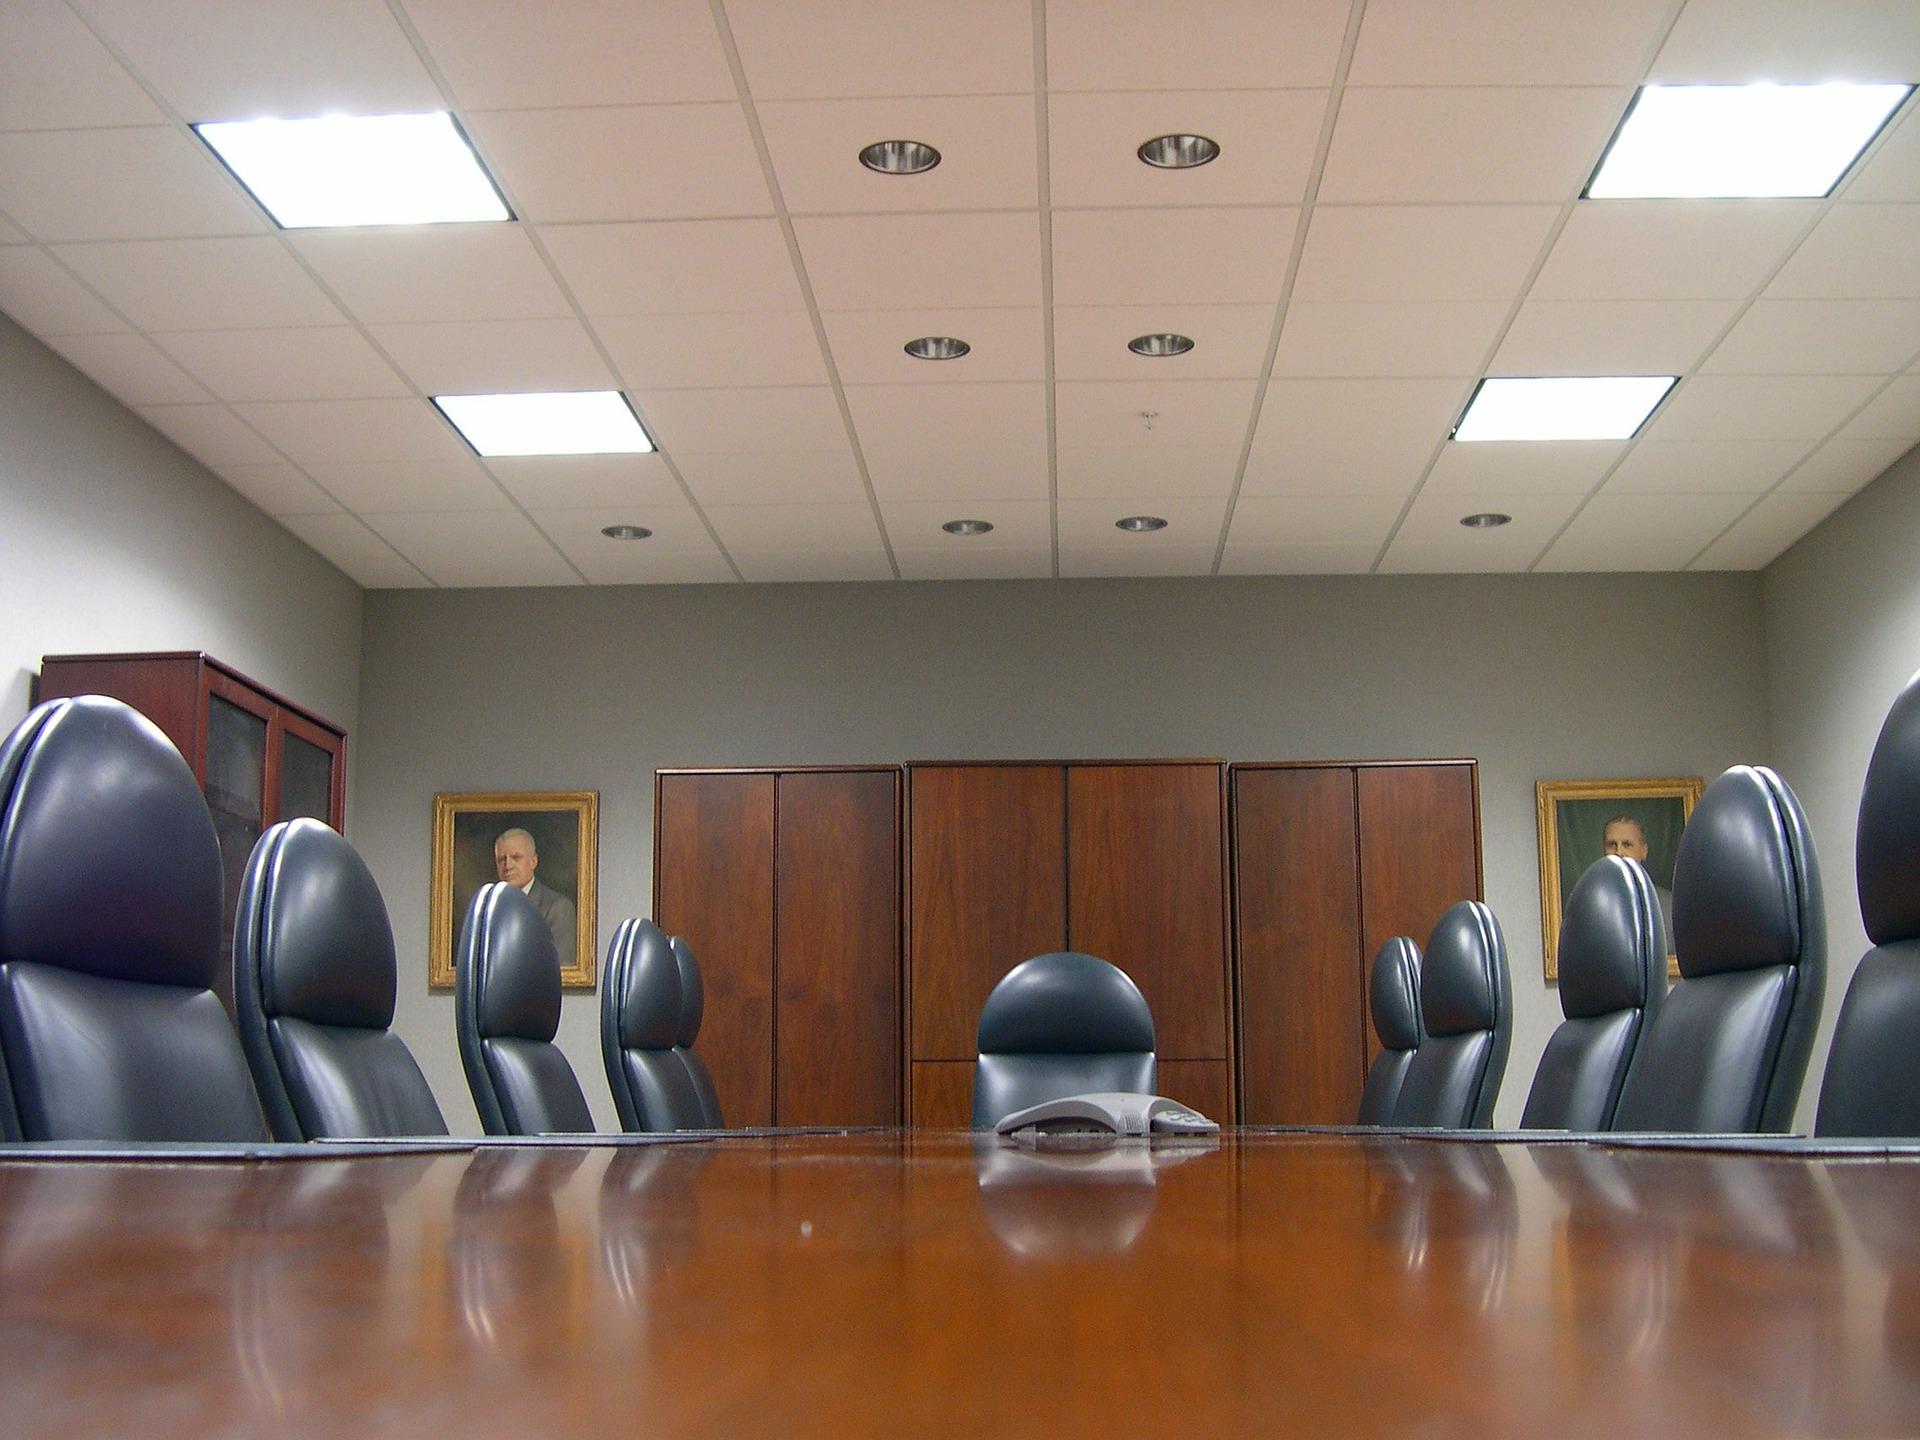 crowley corporate nominee shareholder.jpg